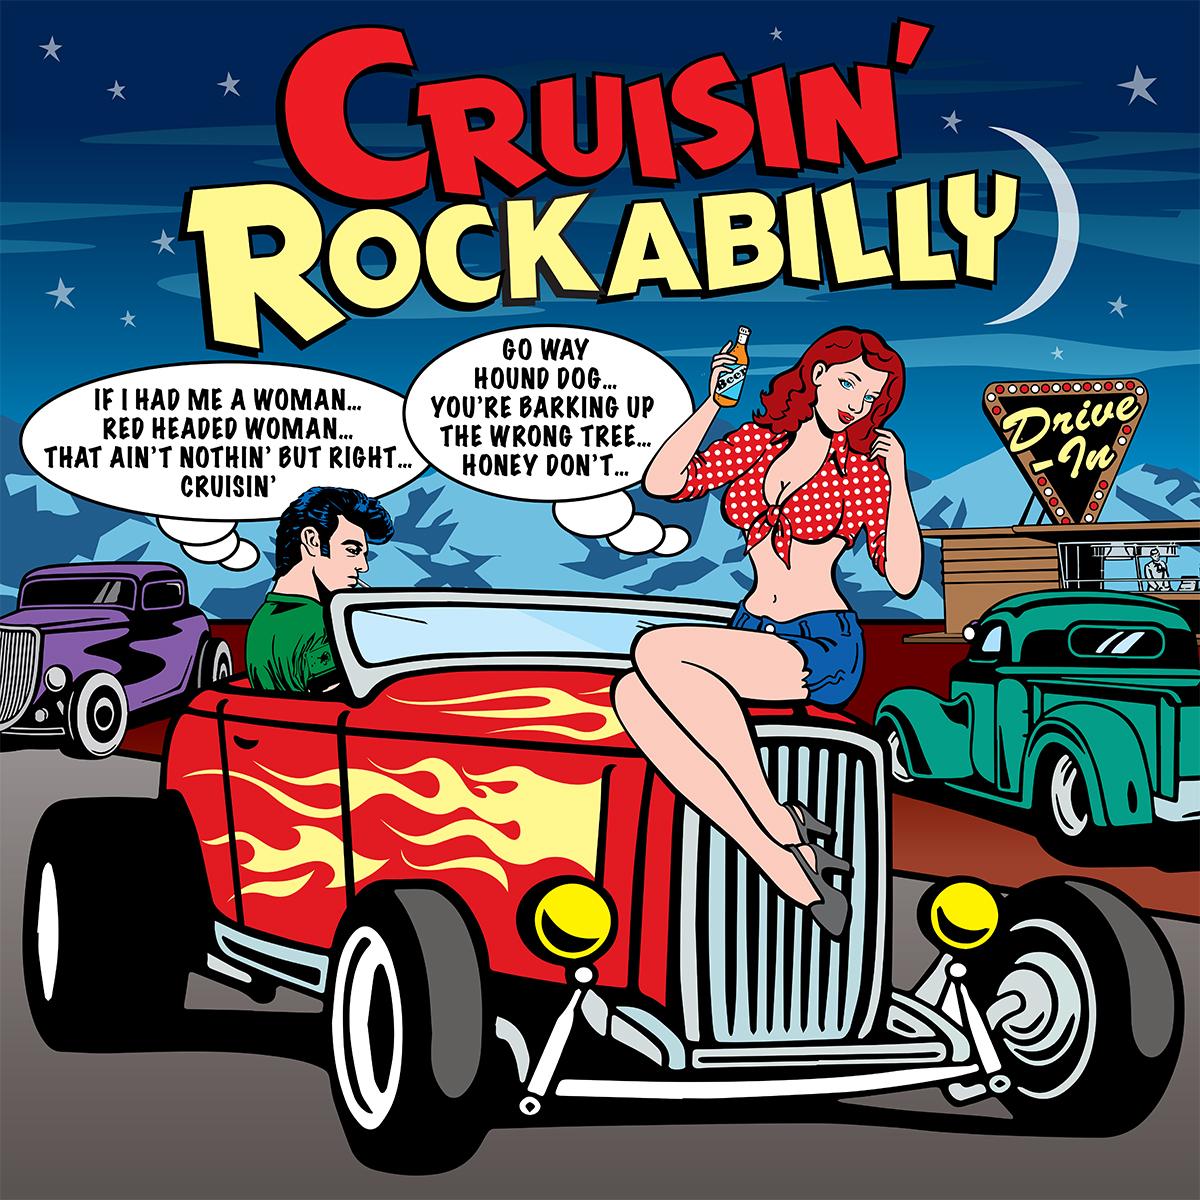 Cruisin Rockabilly